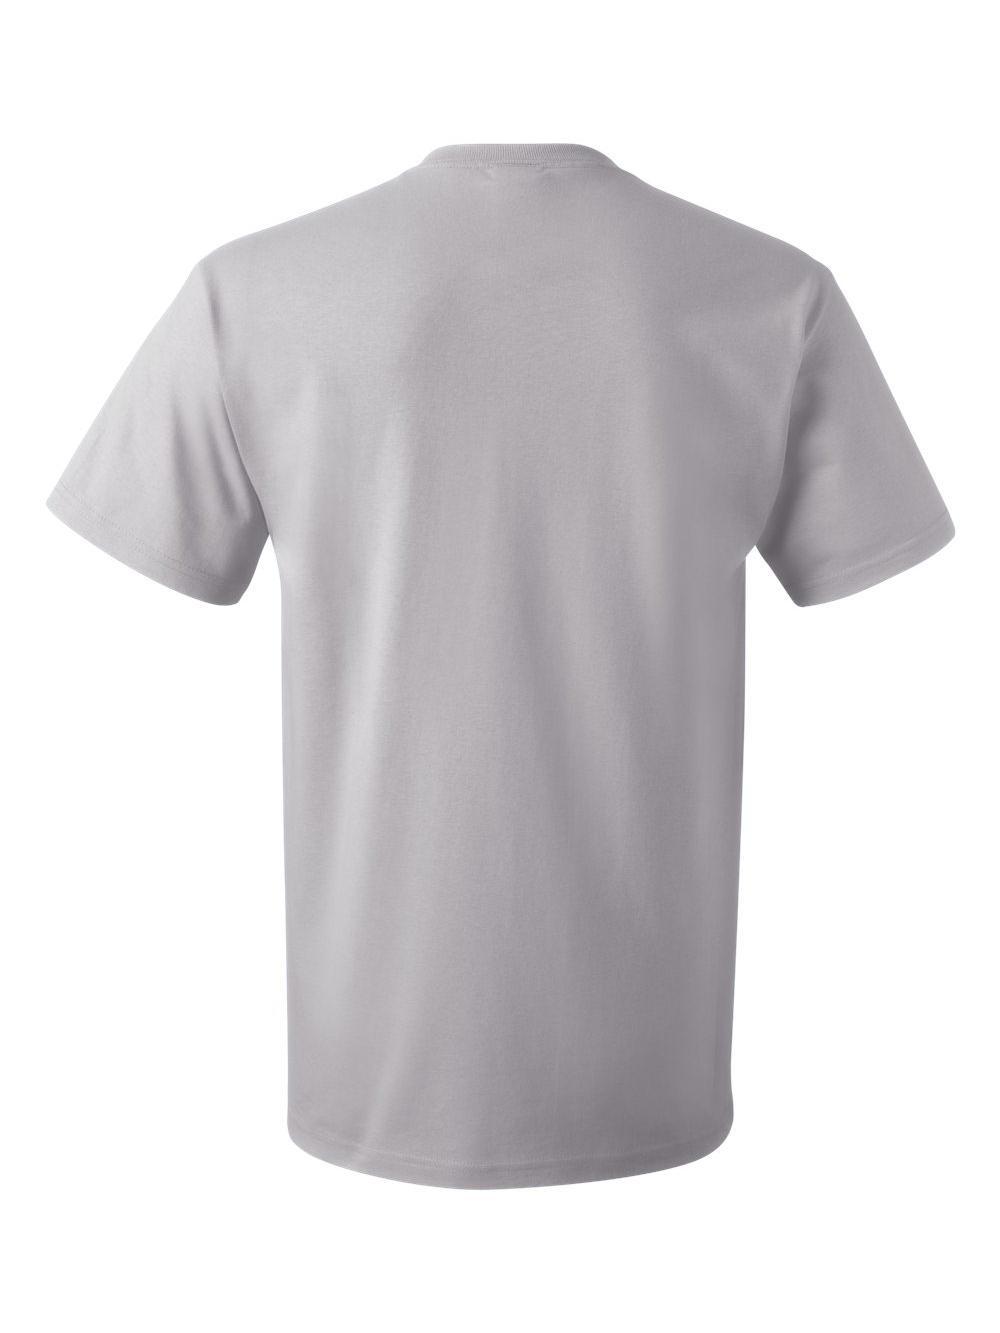 Fruit-of-the-Loom-HD-Cotton-Short-Sleeve-T-Shirt-3930R thumbnail 127